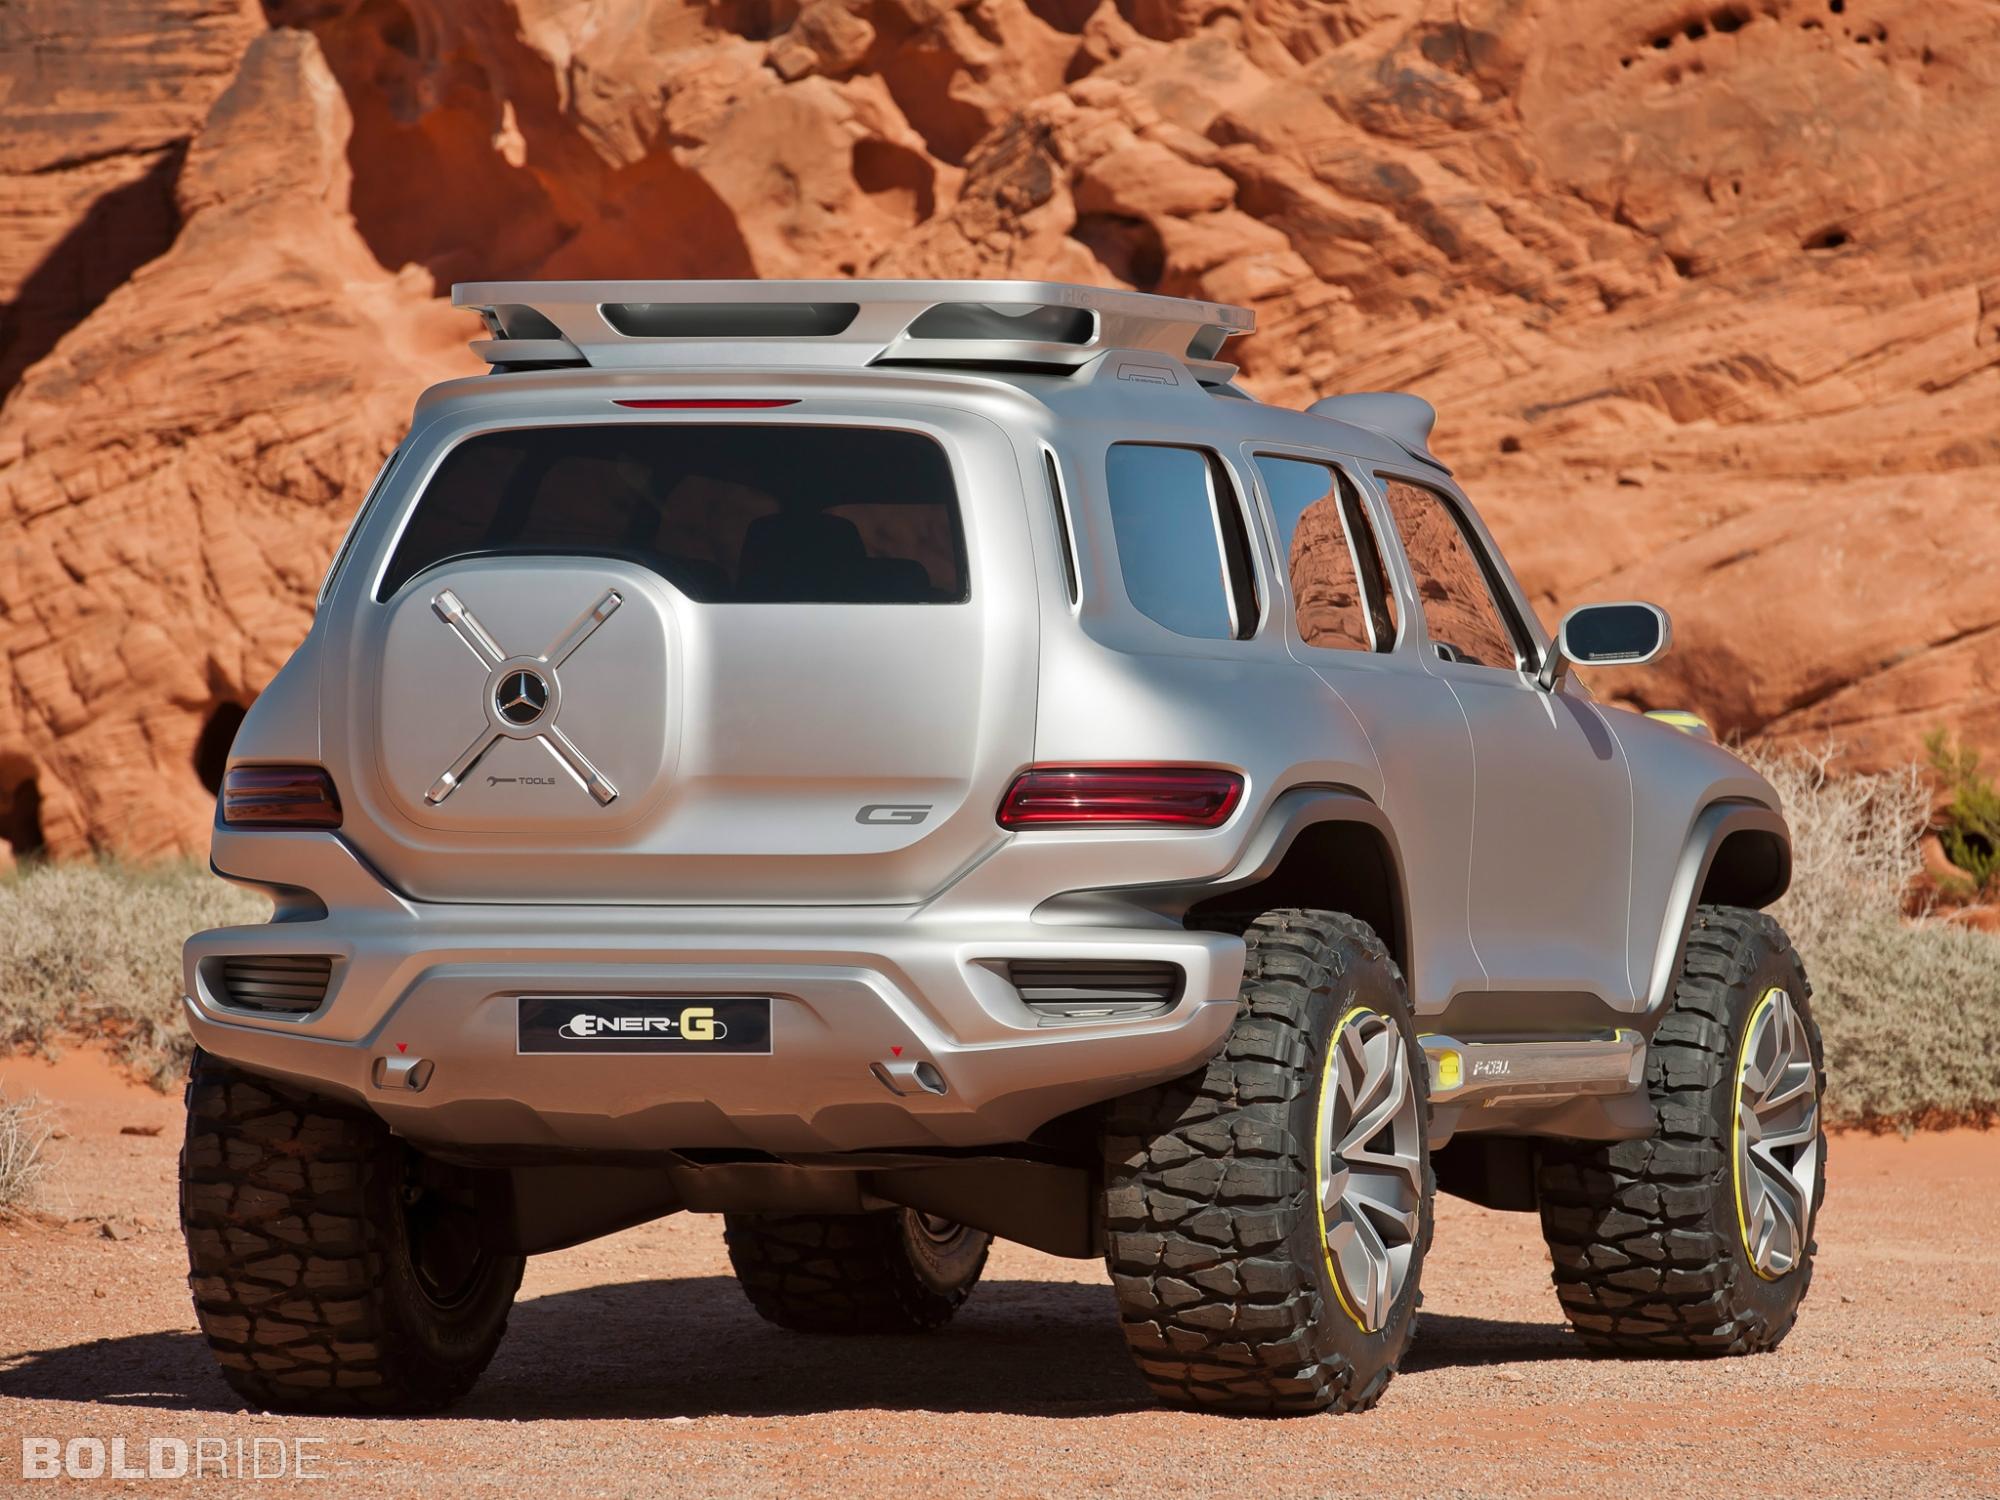 2012 mercedes benz ener g force concept 4x4 offroad suv t wallpaper 2000x1500 79692 wallpaperup - Mercedes Suv 2012